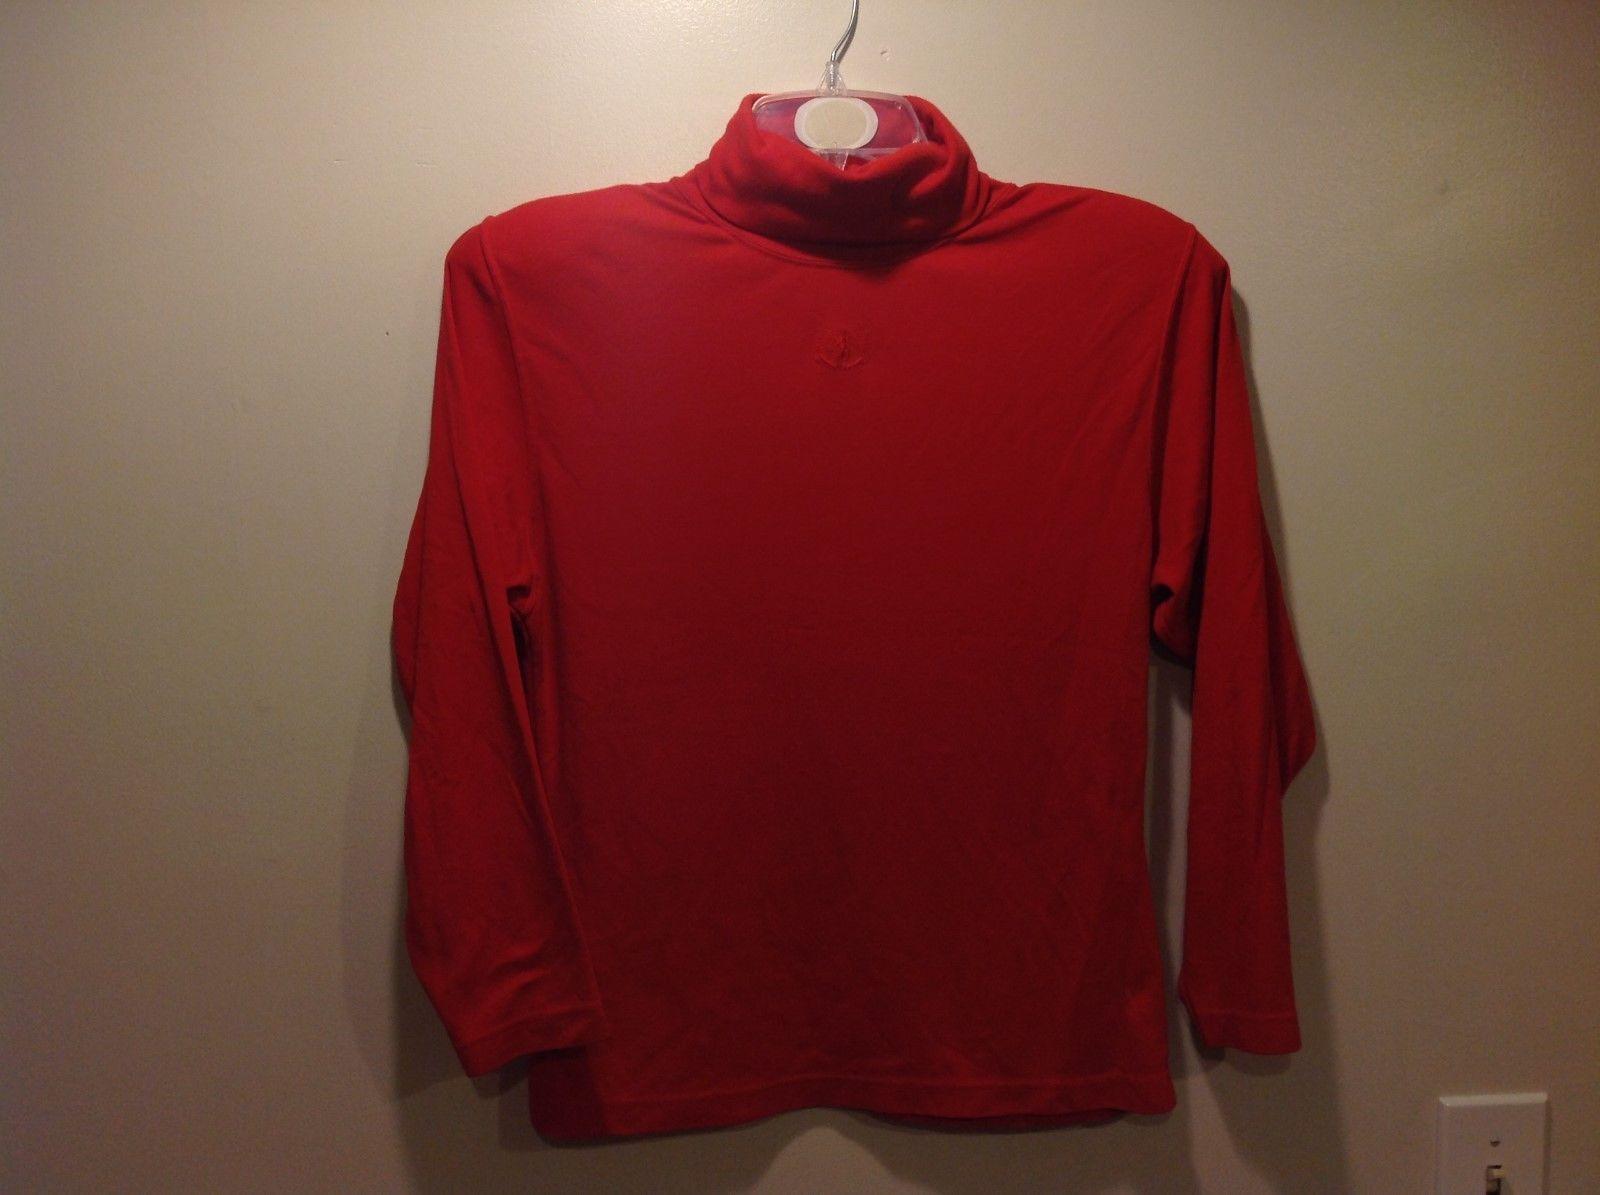 Autograph American Clothing Scarlet Red-Orange Turtleneck Sweater Sz M